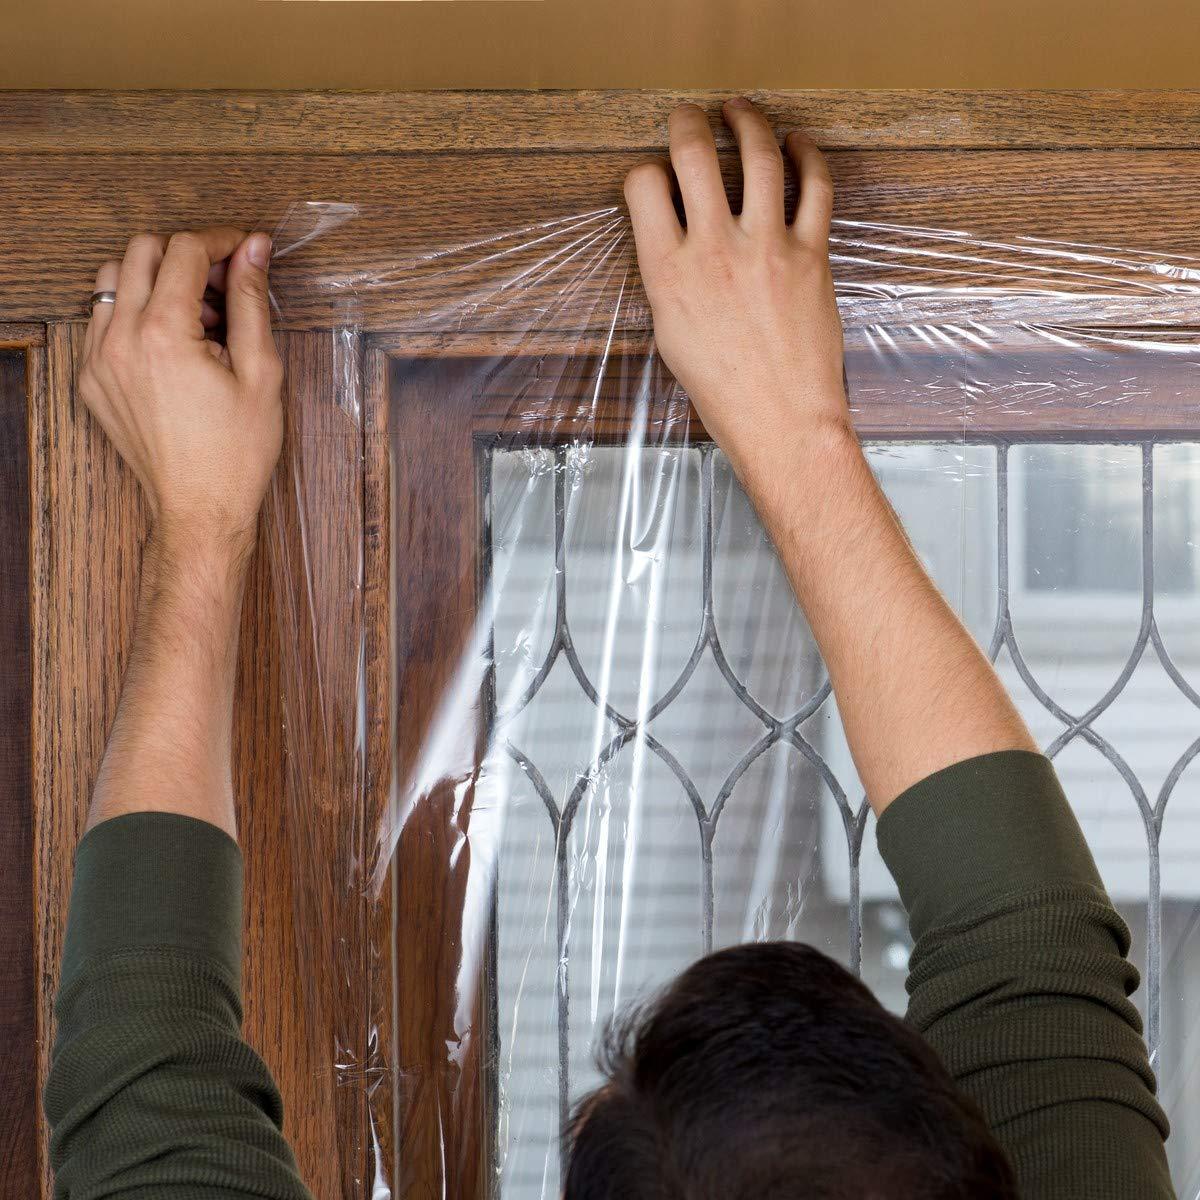 Renewed Duck Brand Indoor 5-Window Shrink Film Insulator Kit 62-Inch x 210-Inch 286217